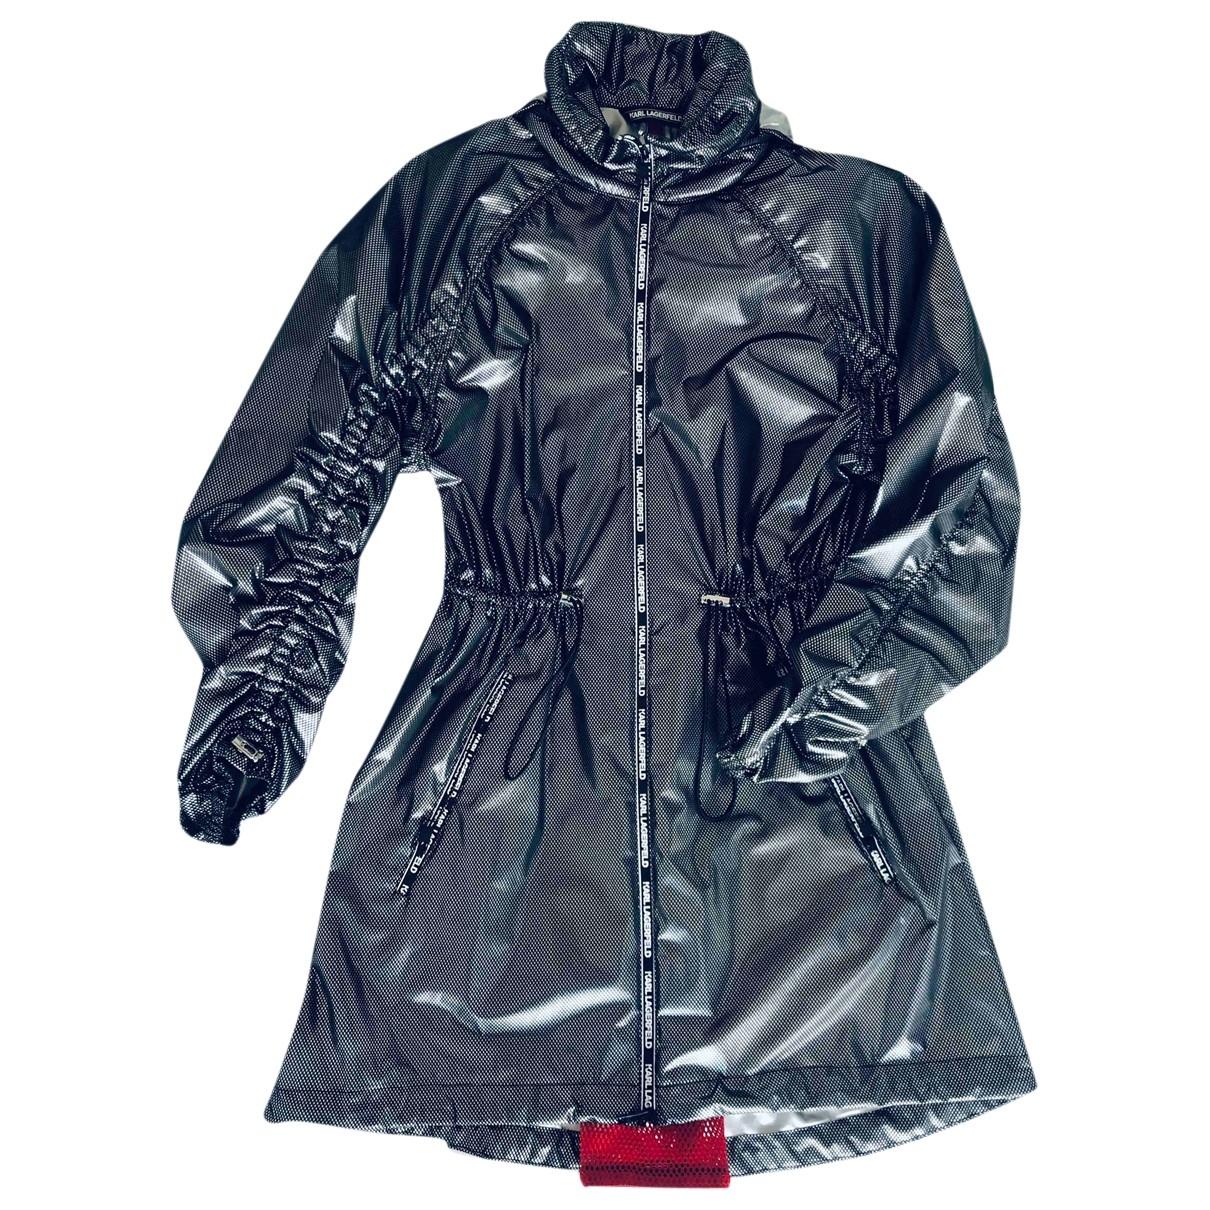 Karl \N Silver coat for Women S International